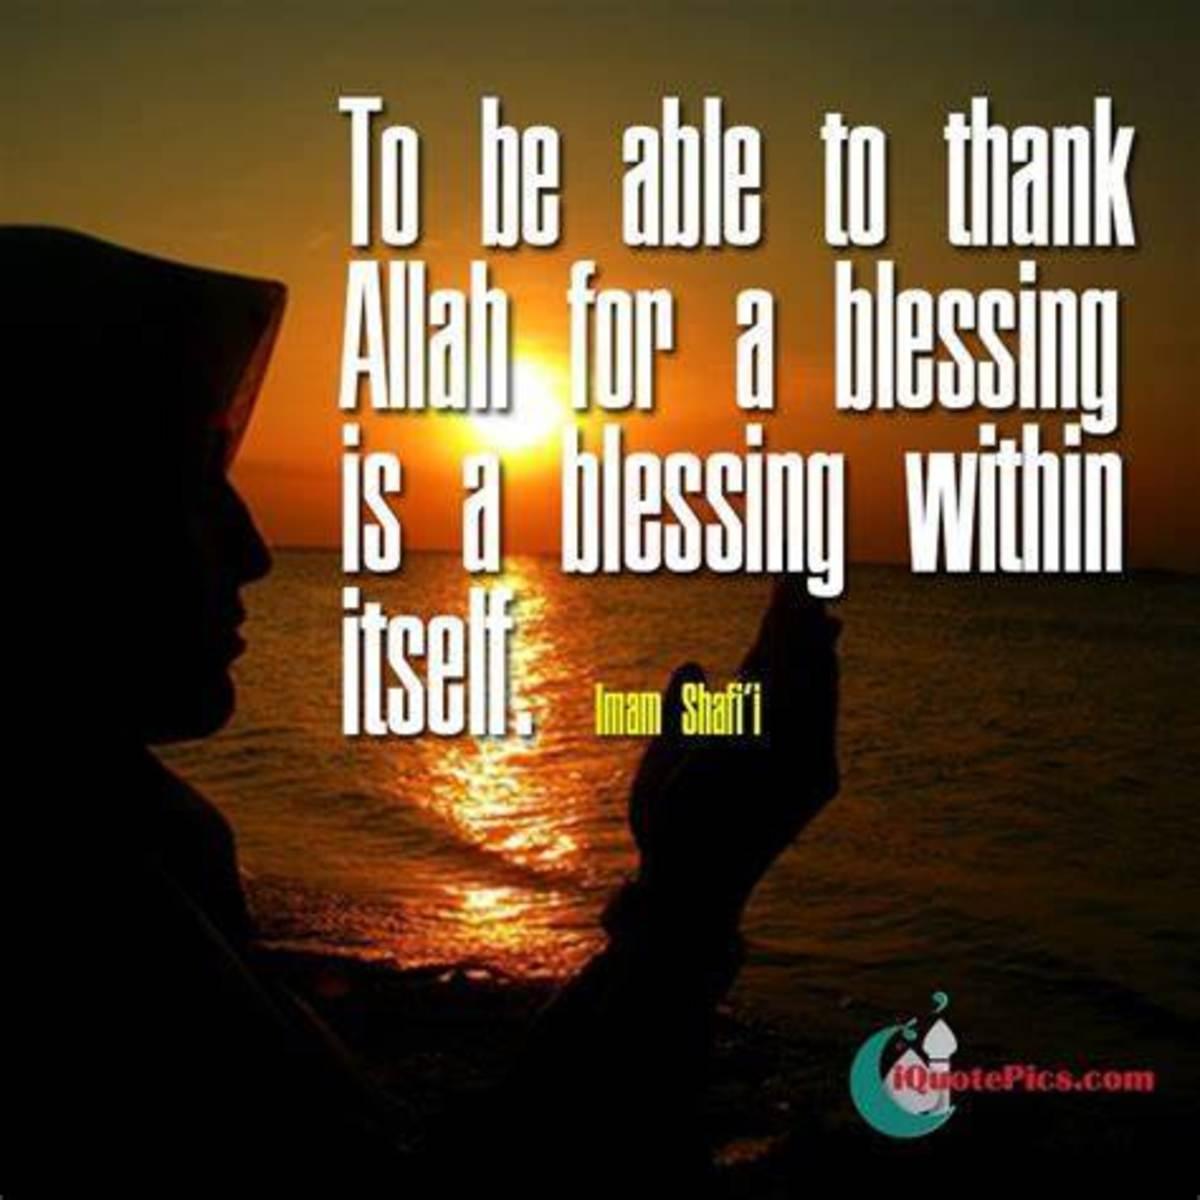 beacon-to-my-dearest-didi-ji-misbah-sheikh-thursdays-homily-for-the-divine-35